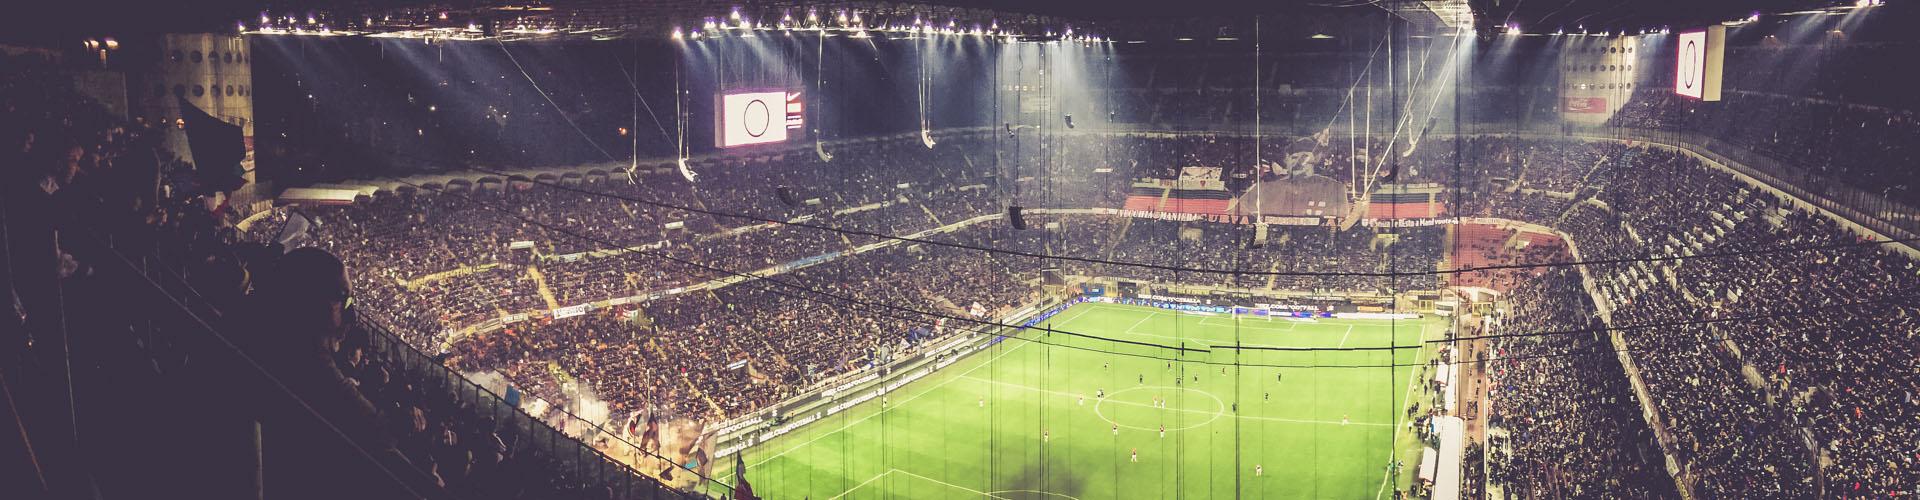 Giuseppe-Meazza-Stadion, Mailand